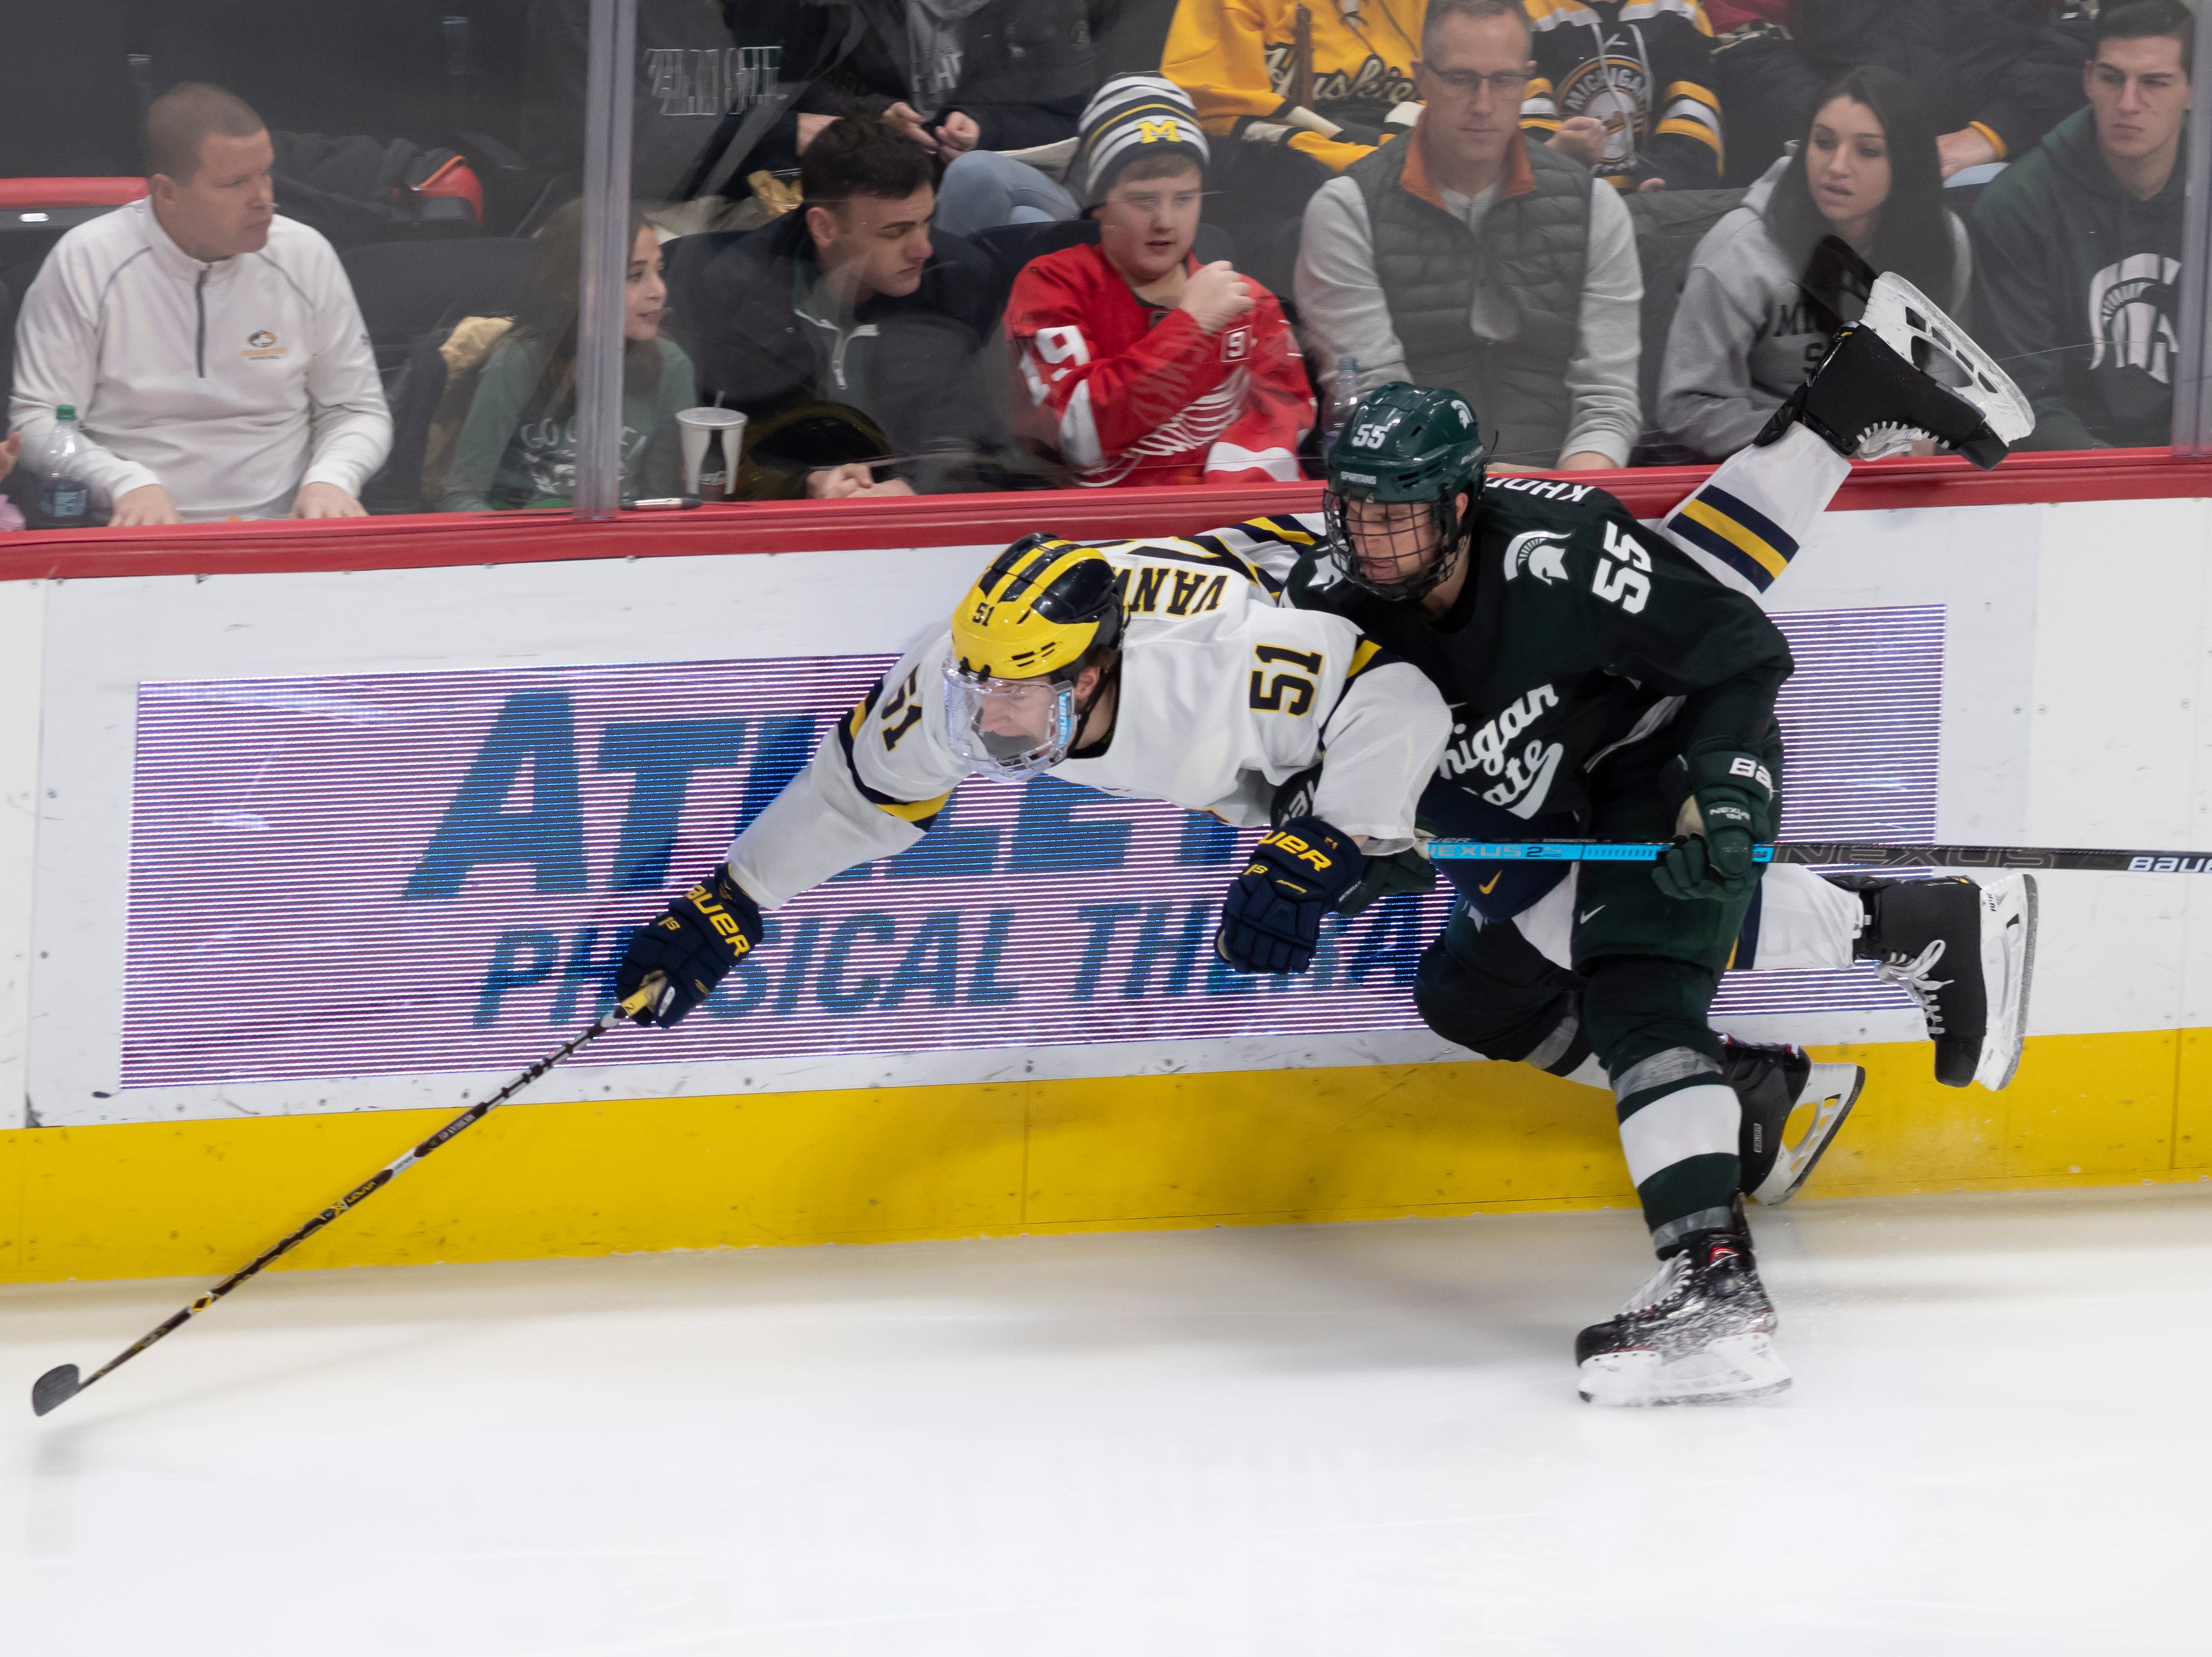 Michigan forward Garrett Van Wyhe gets checked into the boards by Michigan State forward Patrick Khodorenko in the third period.